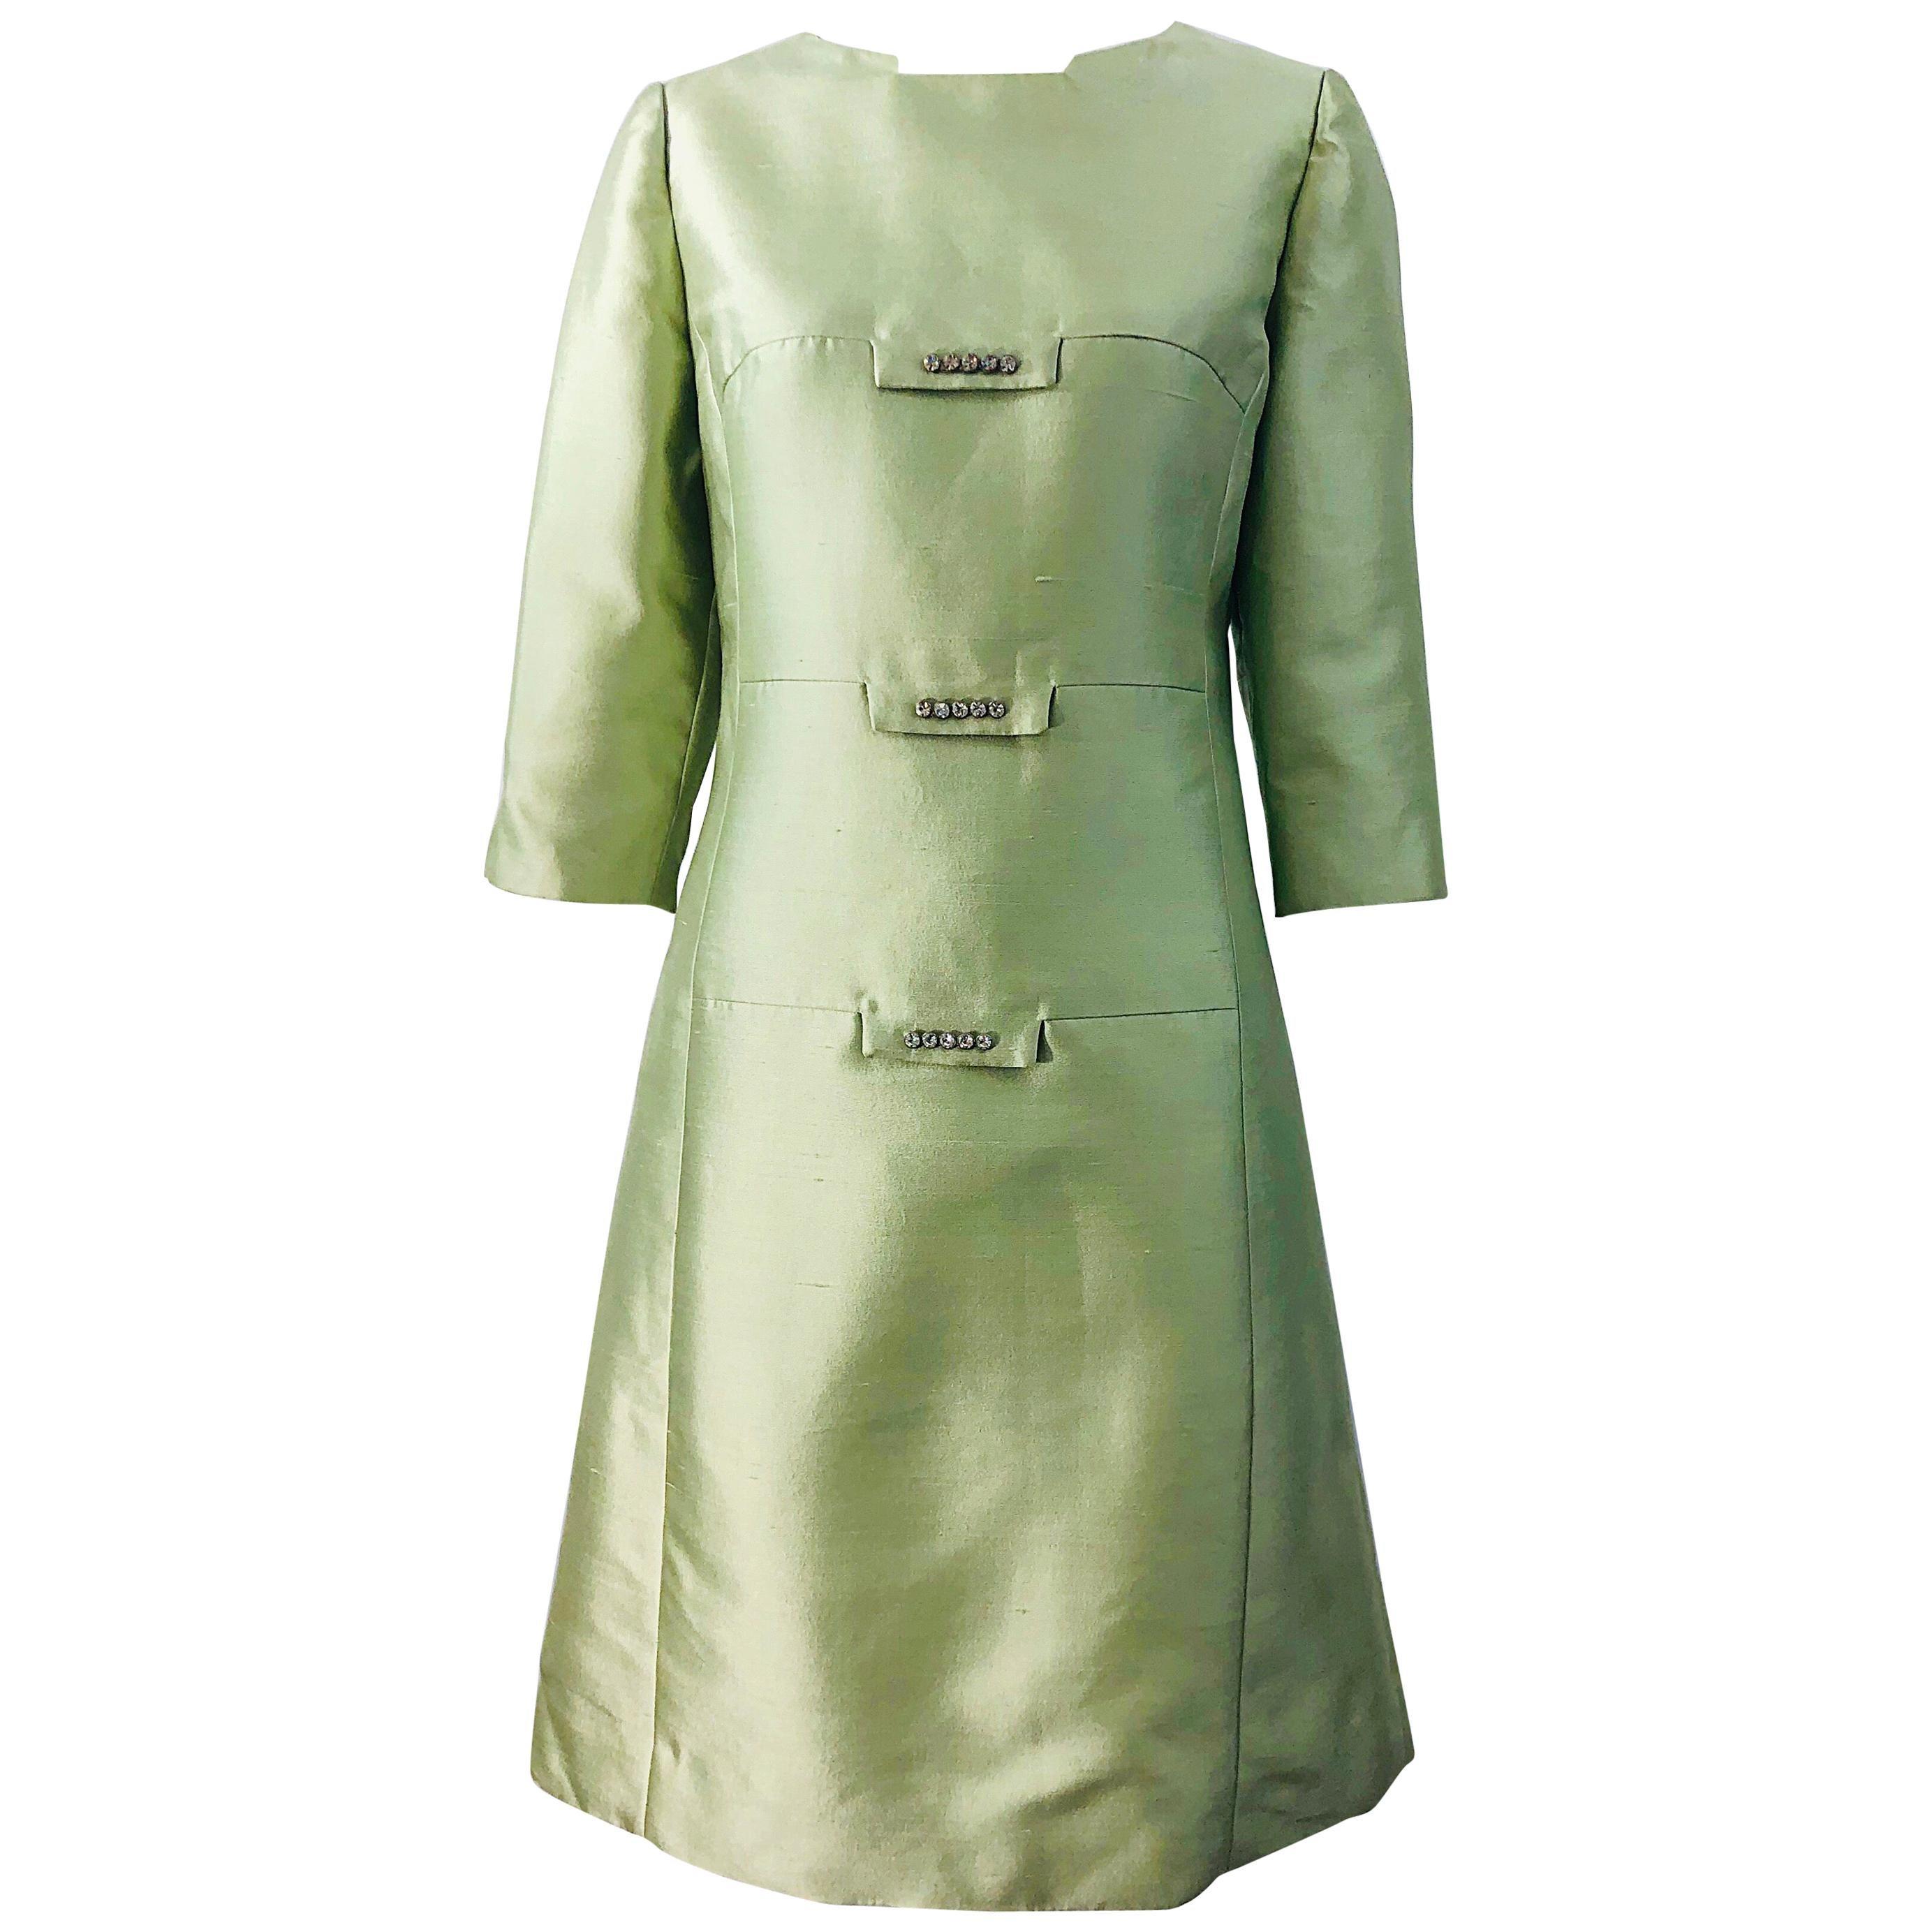 Chic 1960s Mint Green Silk Shantung Rhinestone Vintage 60s A Line Dress